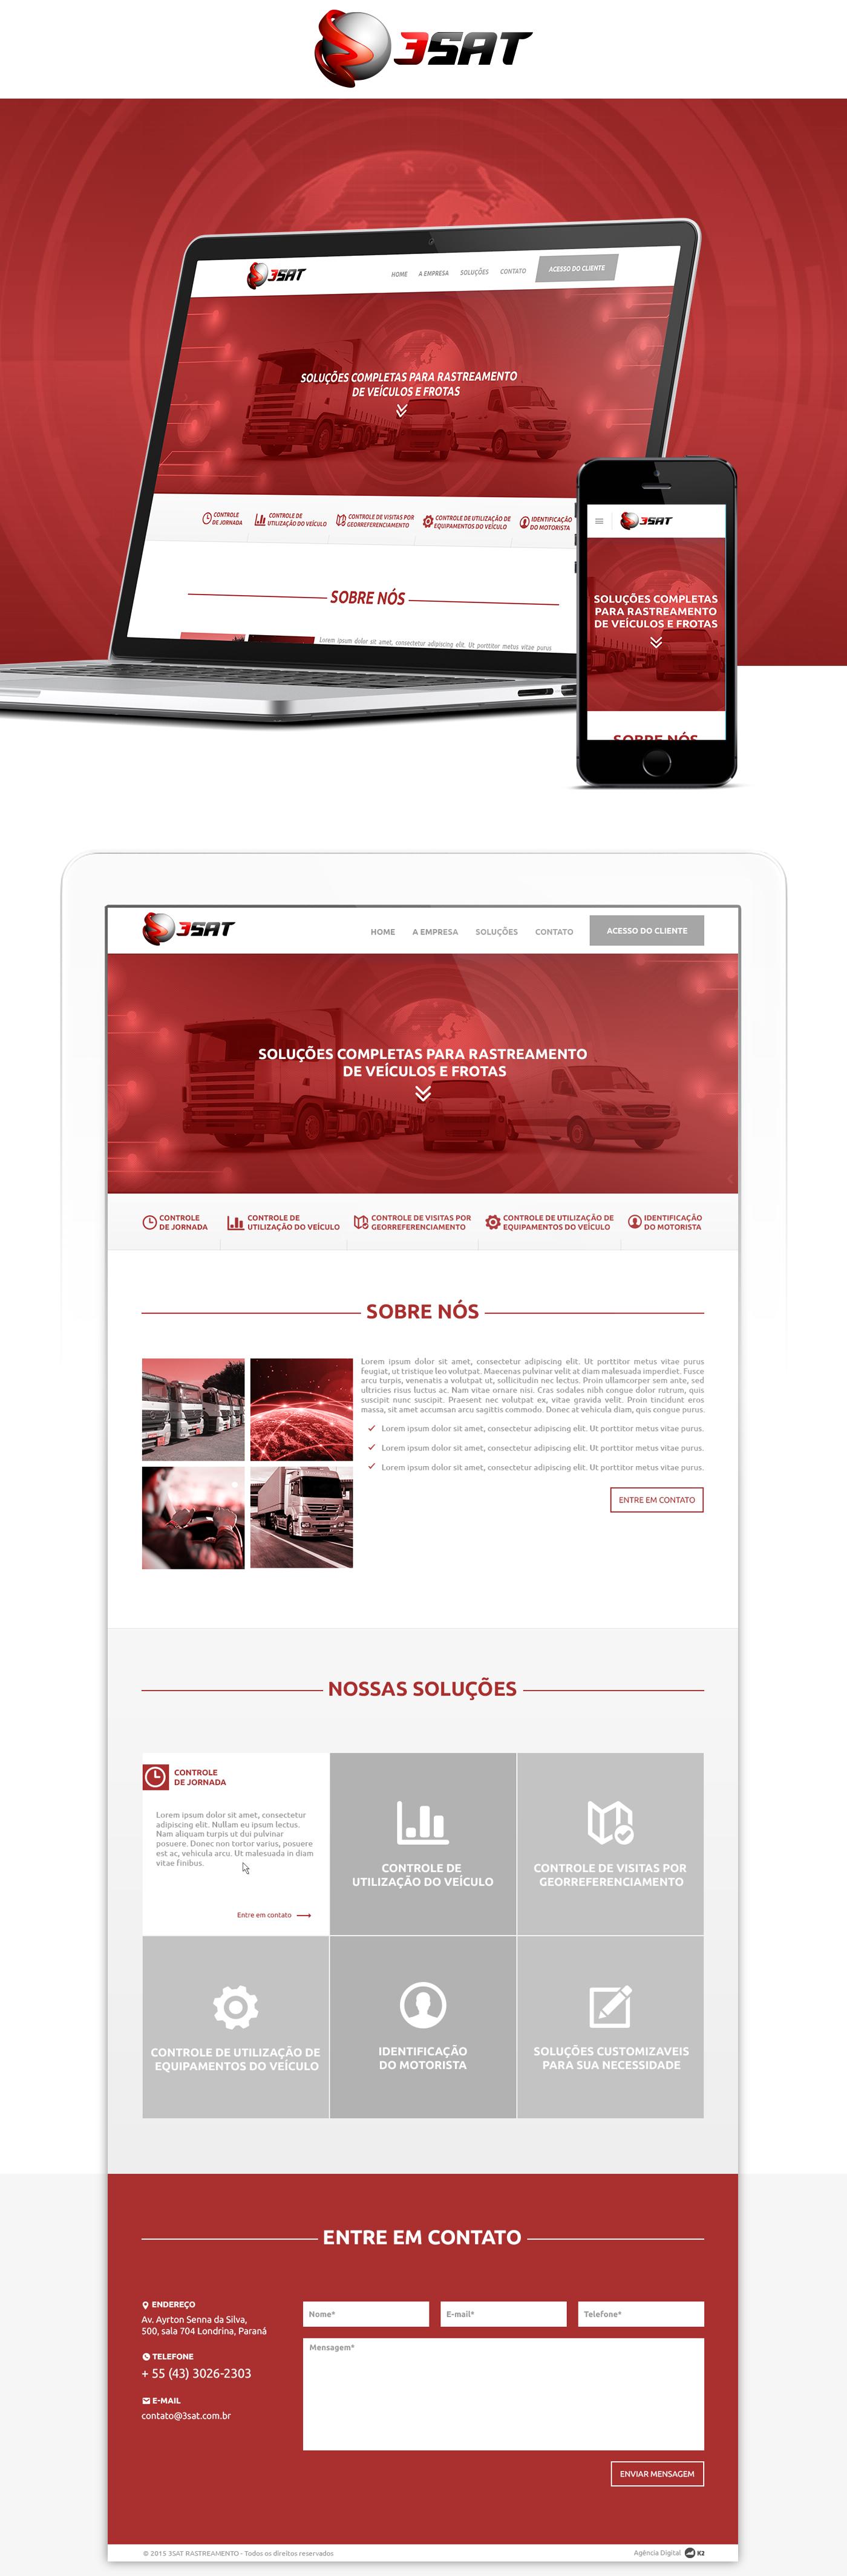 Website webdesigner Webdesign Layout tamplate layoutresponsivo responsivesite tecnologia Technology Responsive responsivo onepage landingpage brand